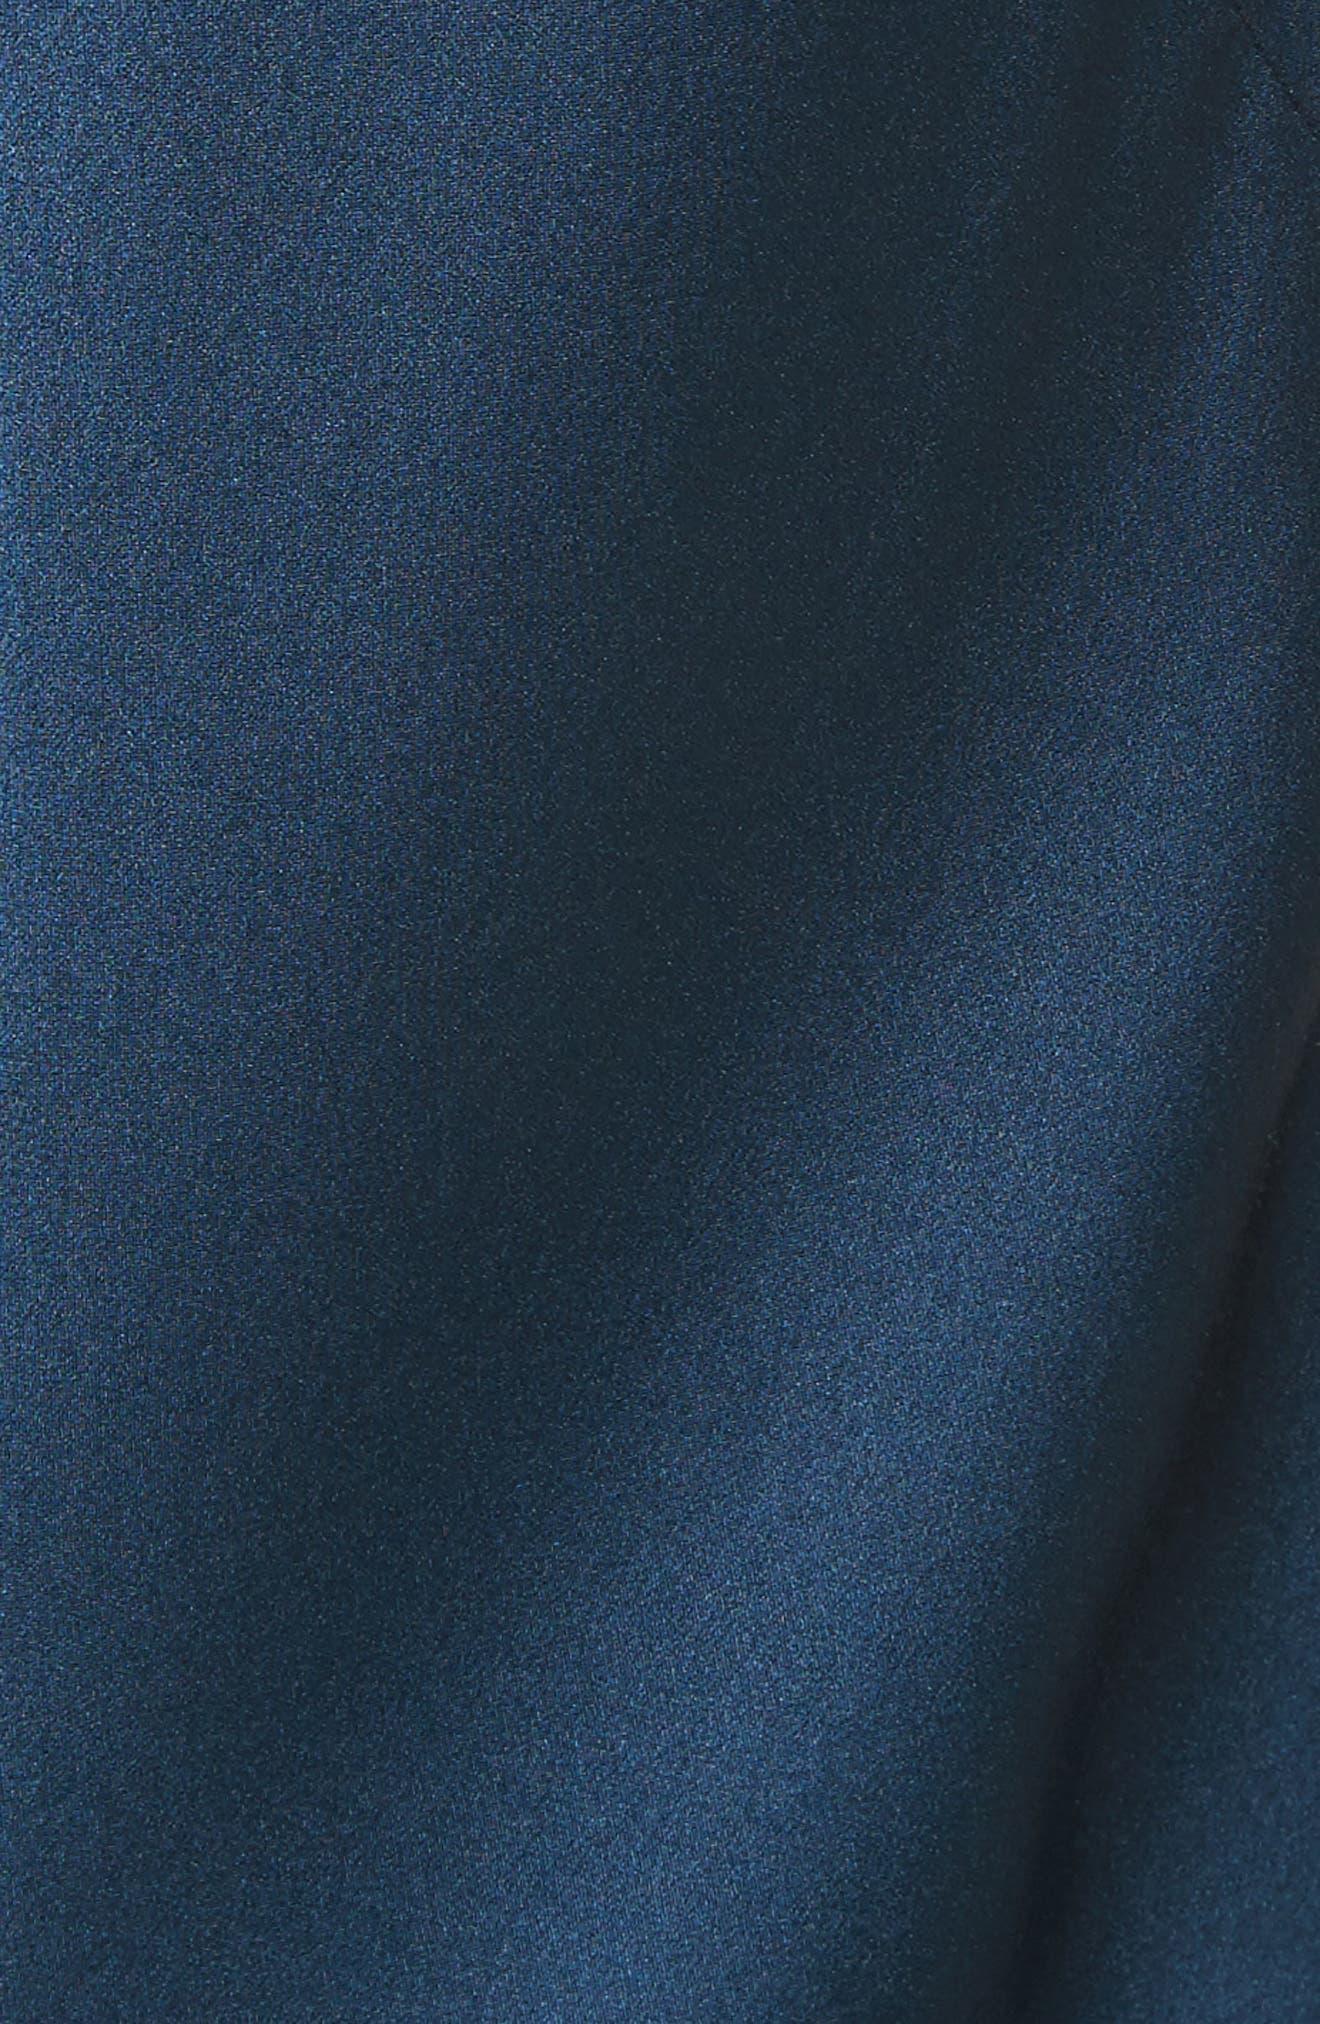 Mikel Stretch Silk Midi Dress,                             Alternate thumbnail 5, color,                             420